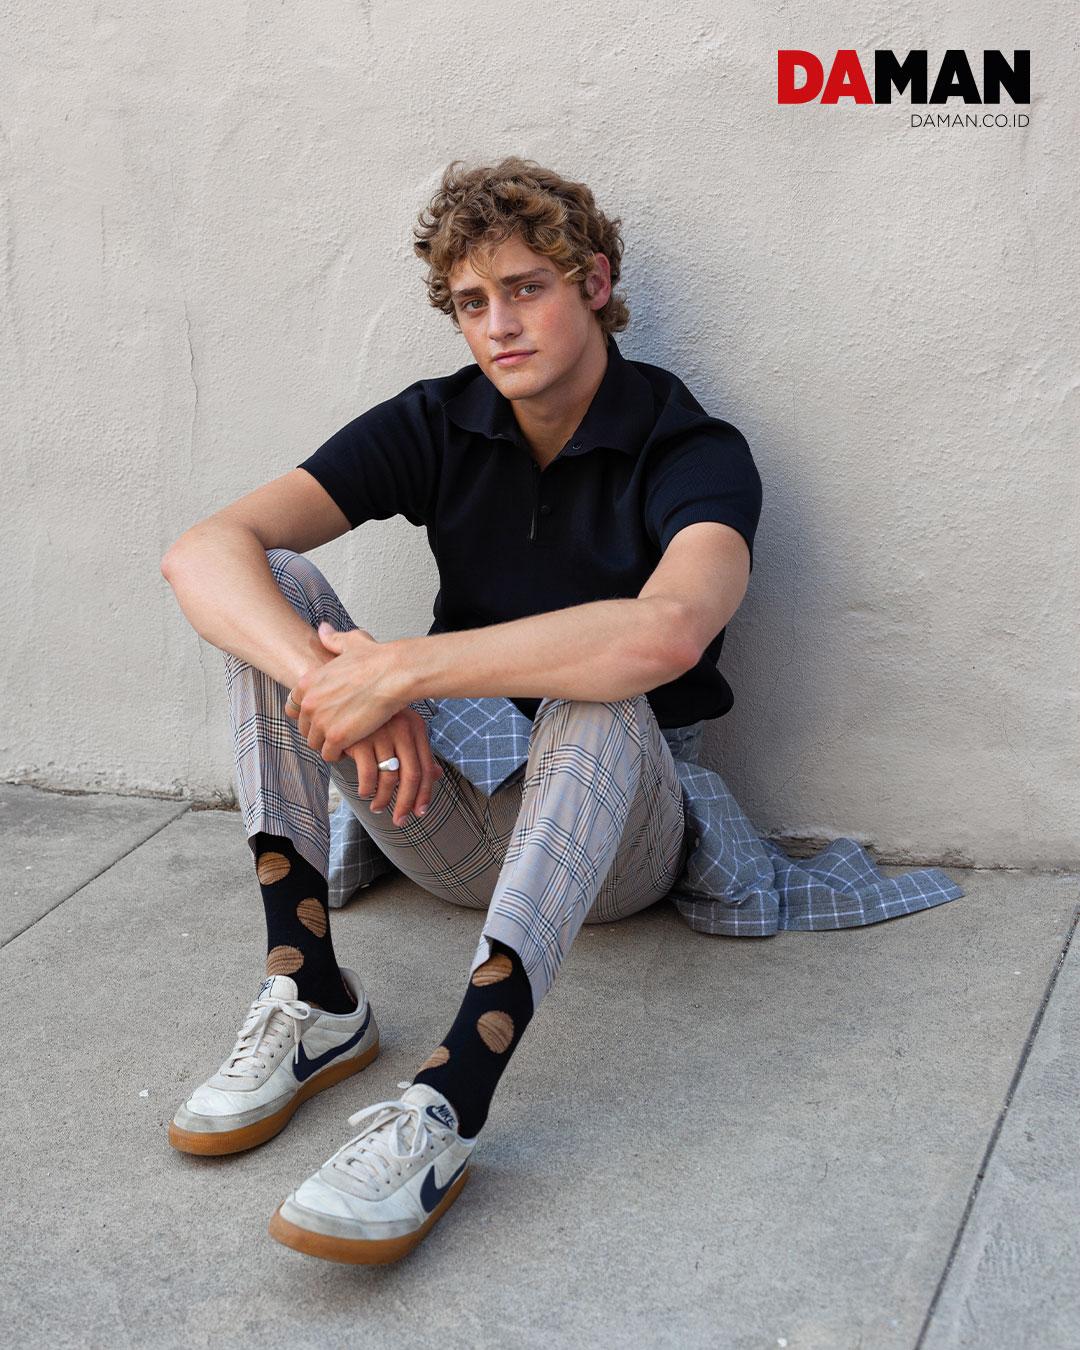 Rudsak - poloshirt Rupert & Buckley - plaid flannel H&M - plaid pant Sock It Up - socks Nike - sneakers